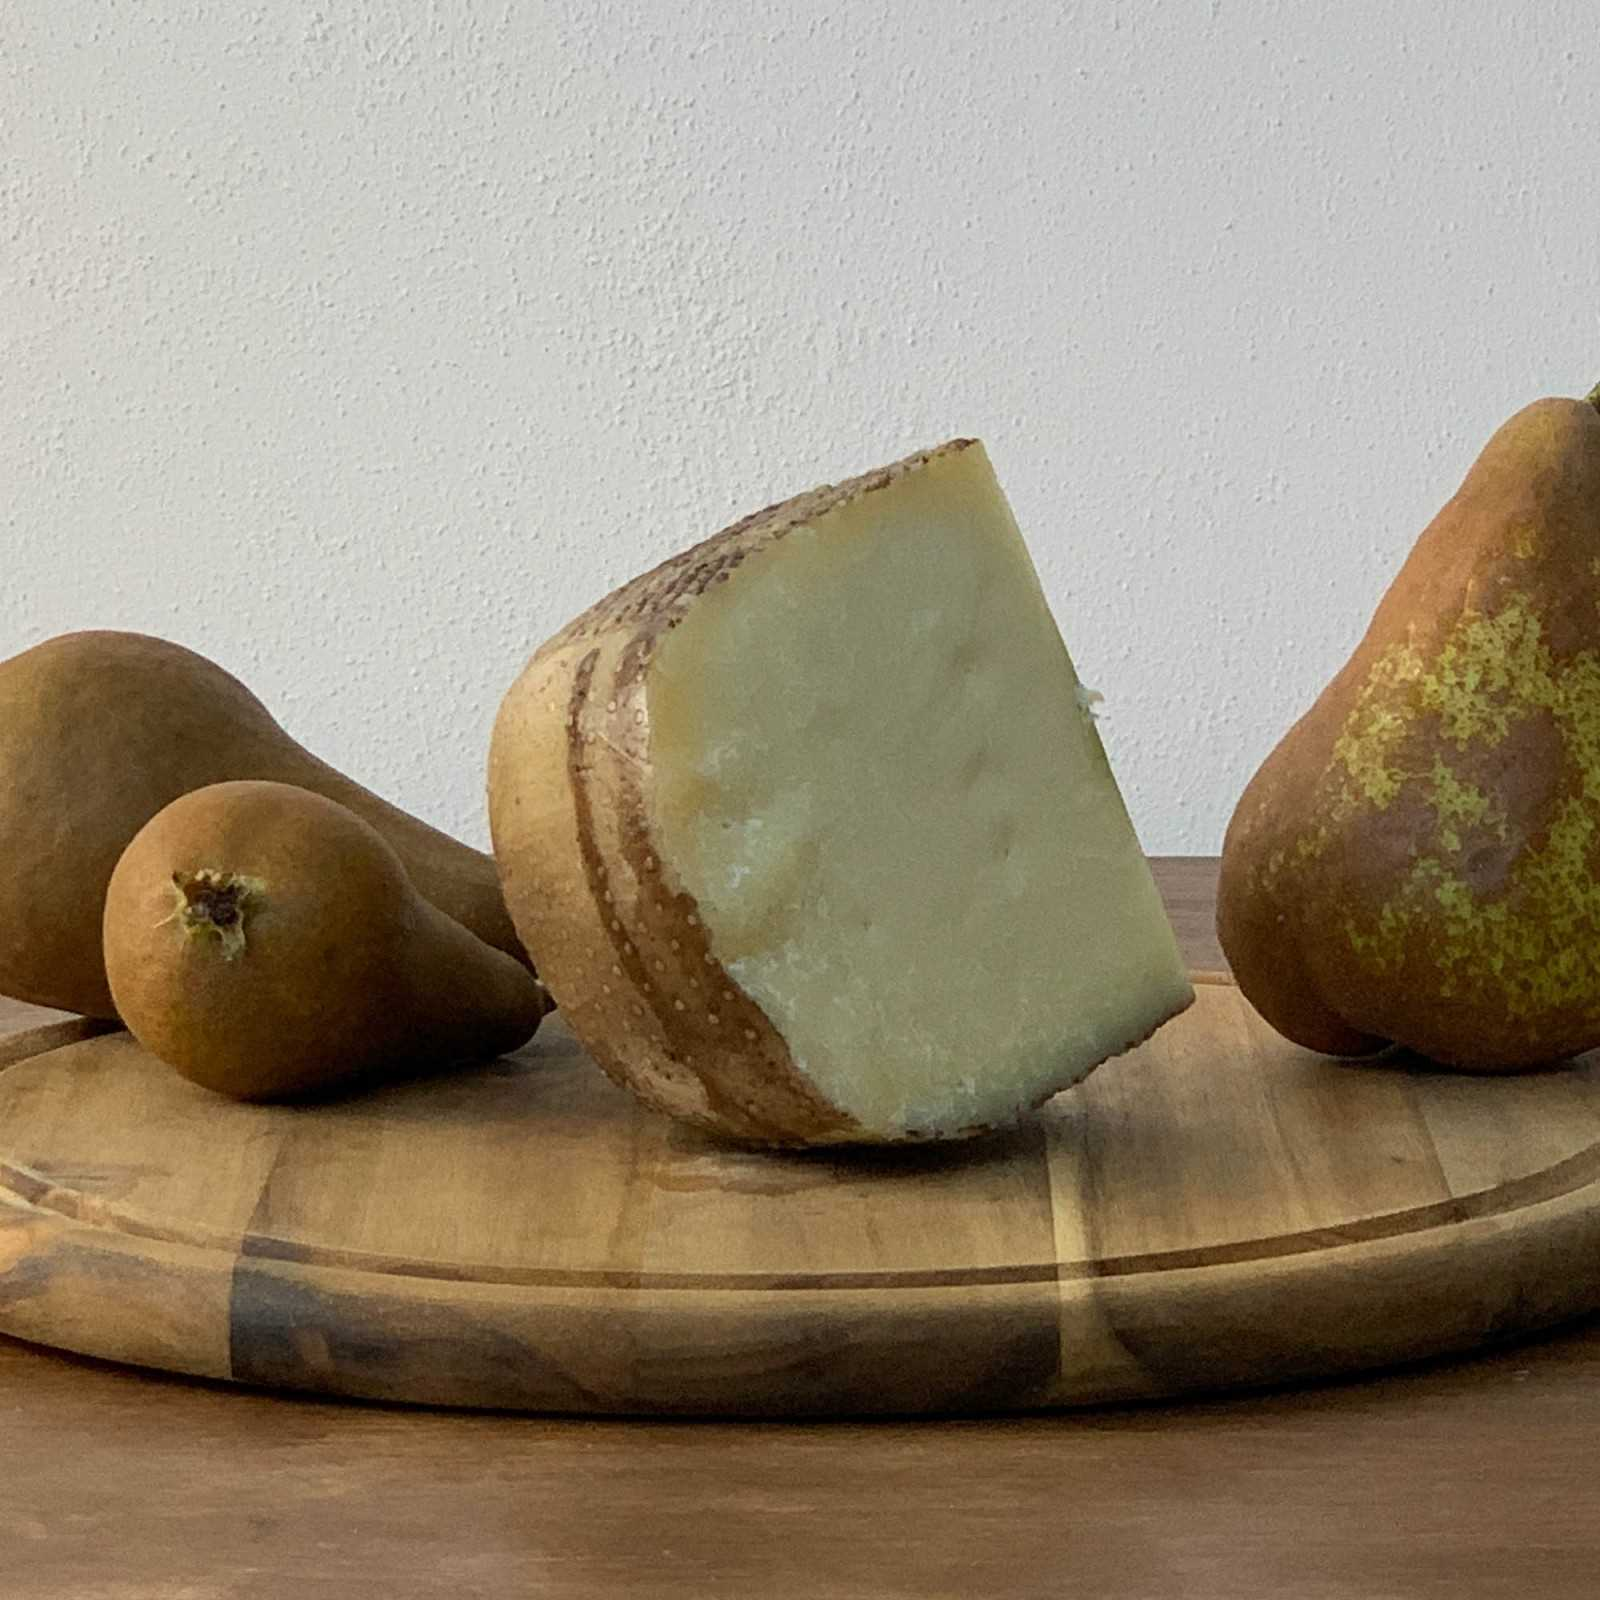 Pecorino Cheese With Pears.